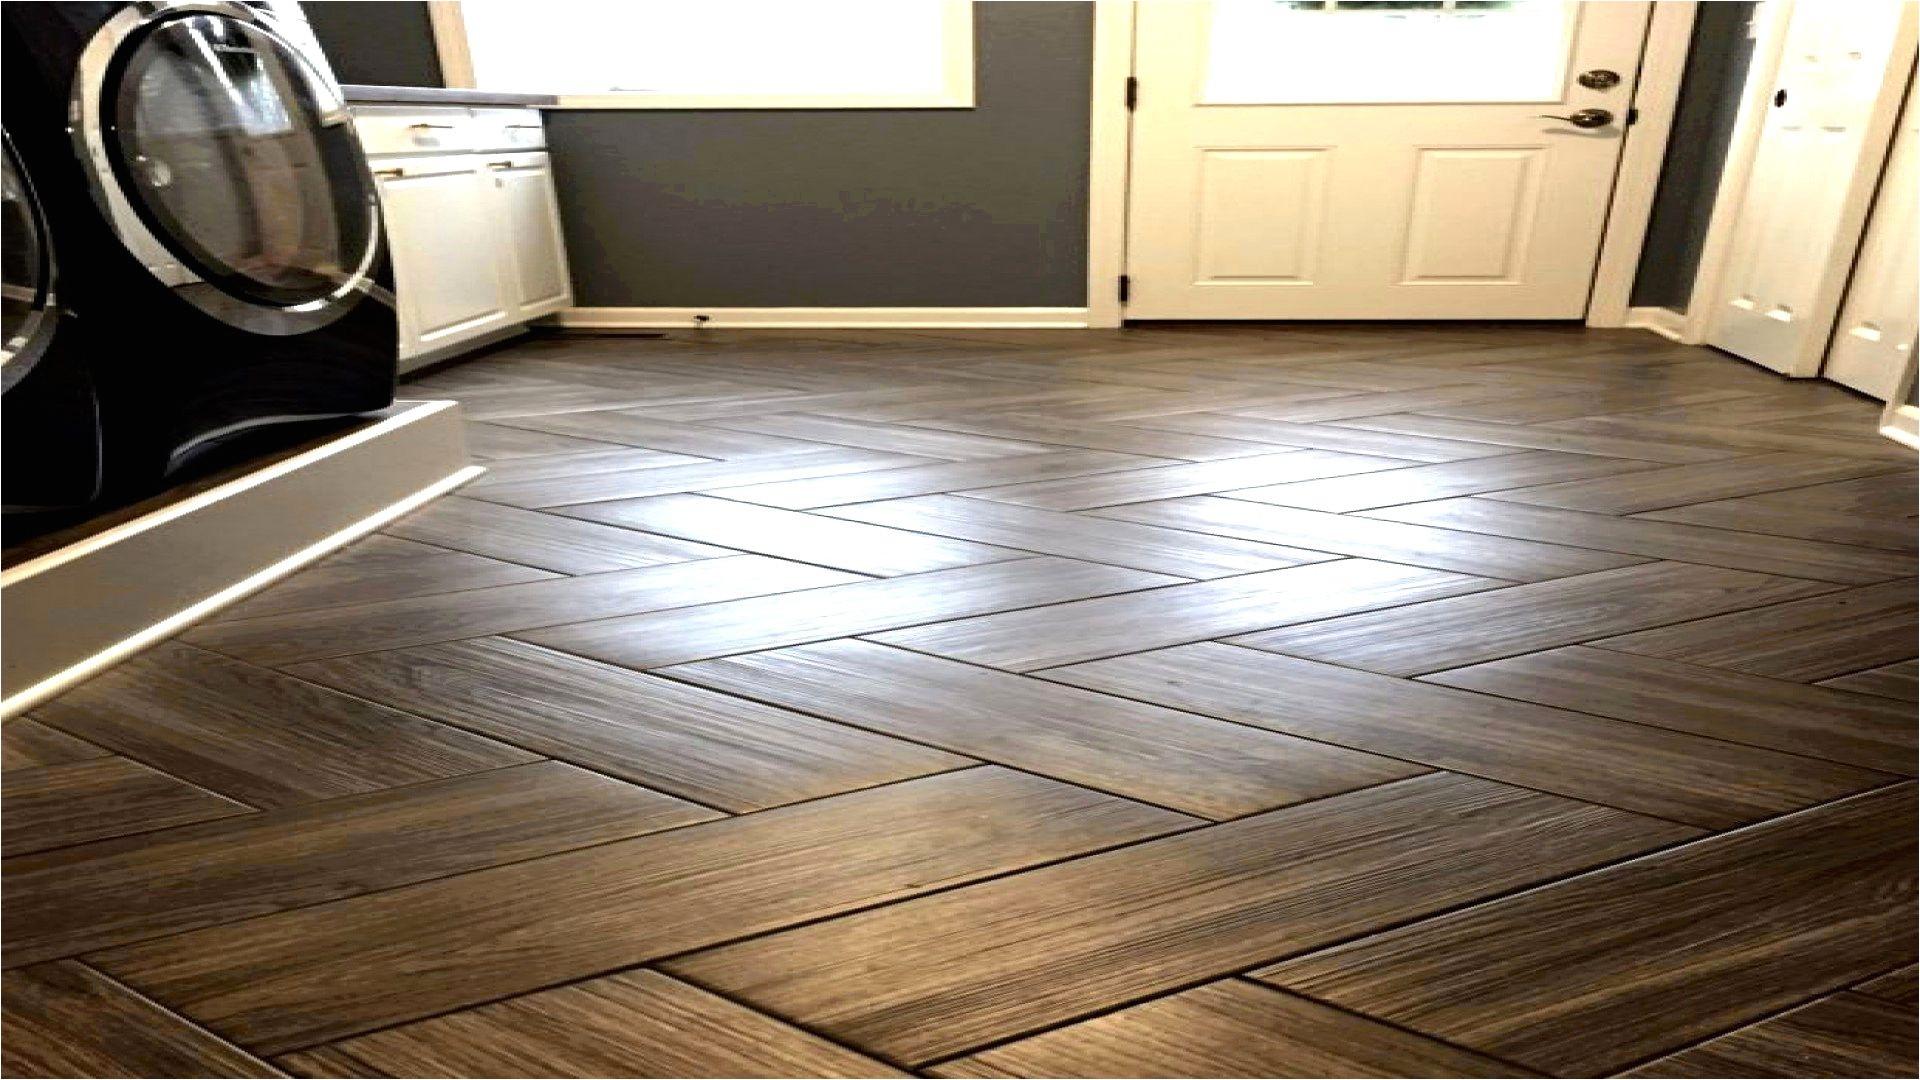 liquidation hardwood flooring of gluing vinyl plank flooring on walls bradshomefurnishings within 40 how to remove vinyl floor tile inspiration